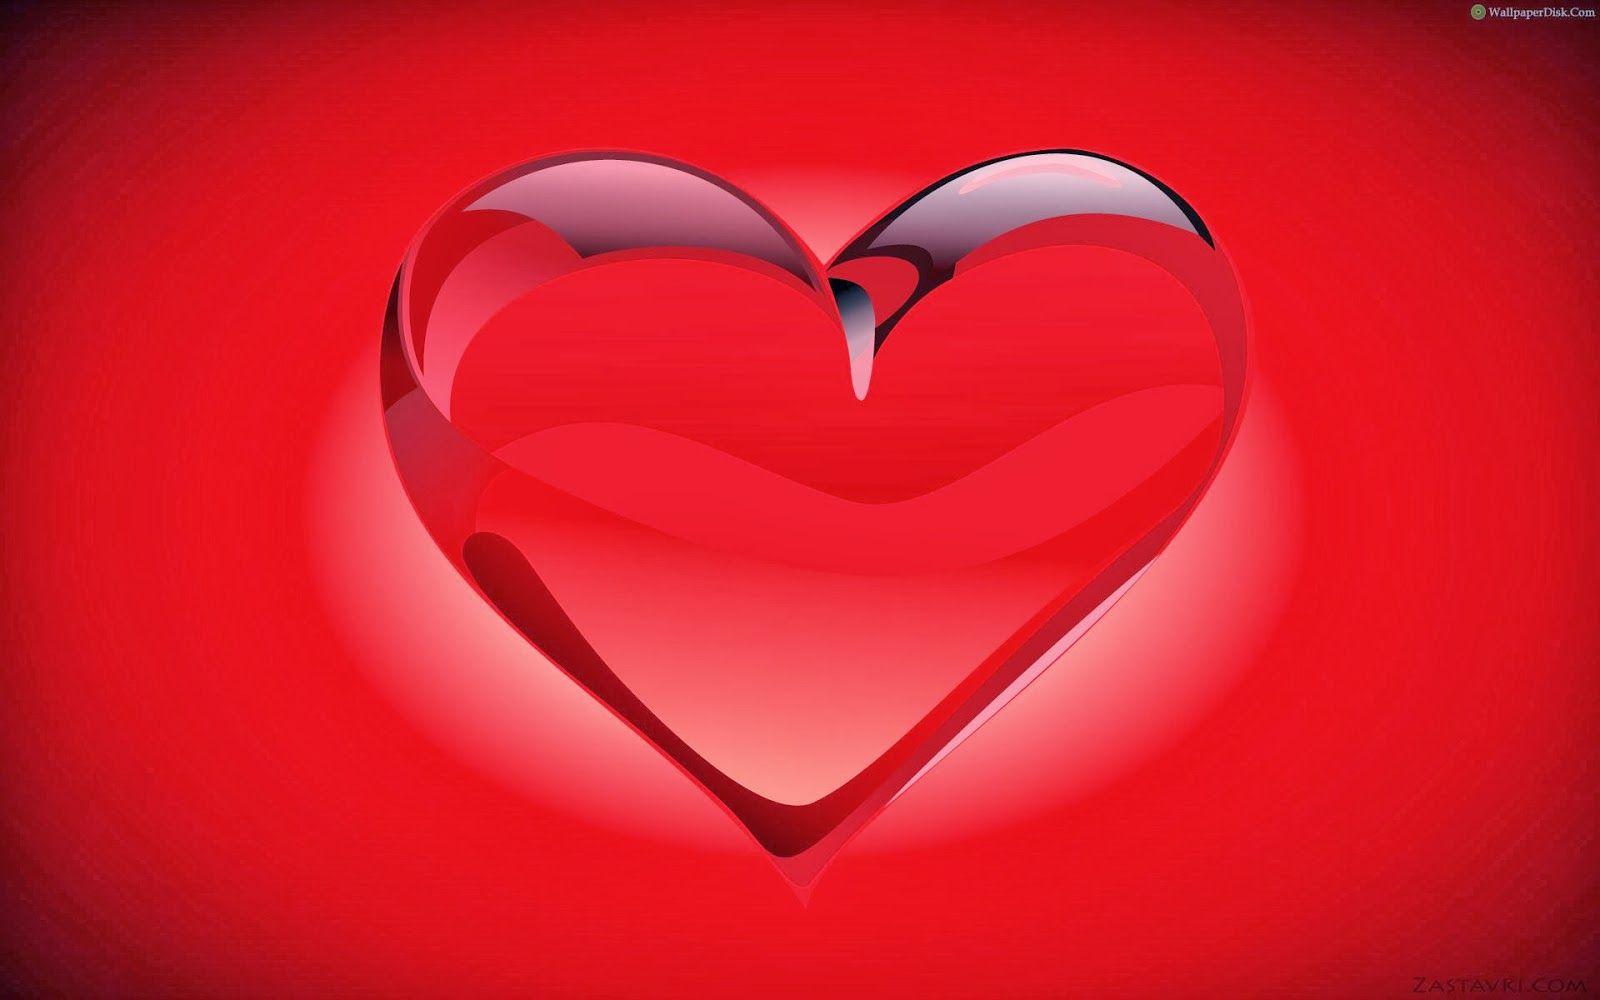 Be my valentine wallpaper be my valentine live wallpaper be my be my valentine wallpaper be my valentine live wallpaper be my valentine live wallpaper apk be my valentine wallpaper be my valentine wallpape buycottarizona Gallery